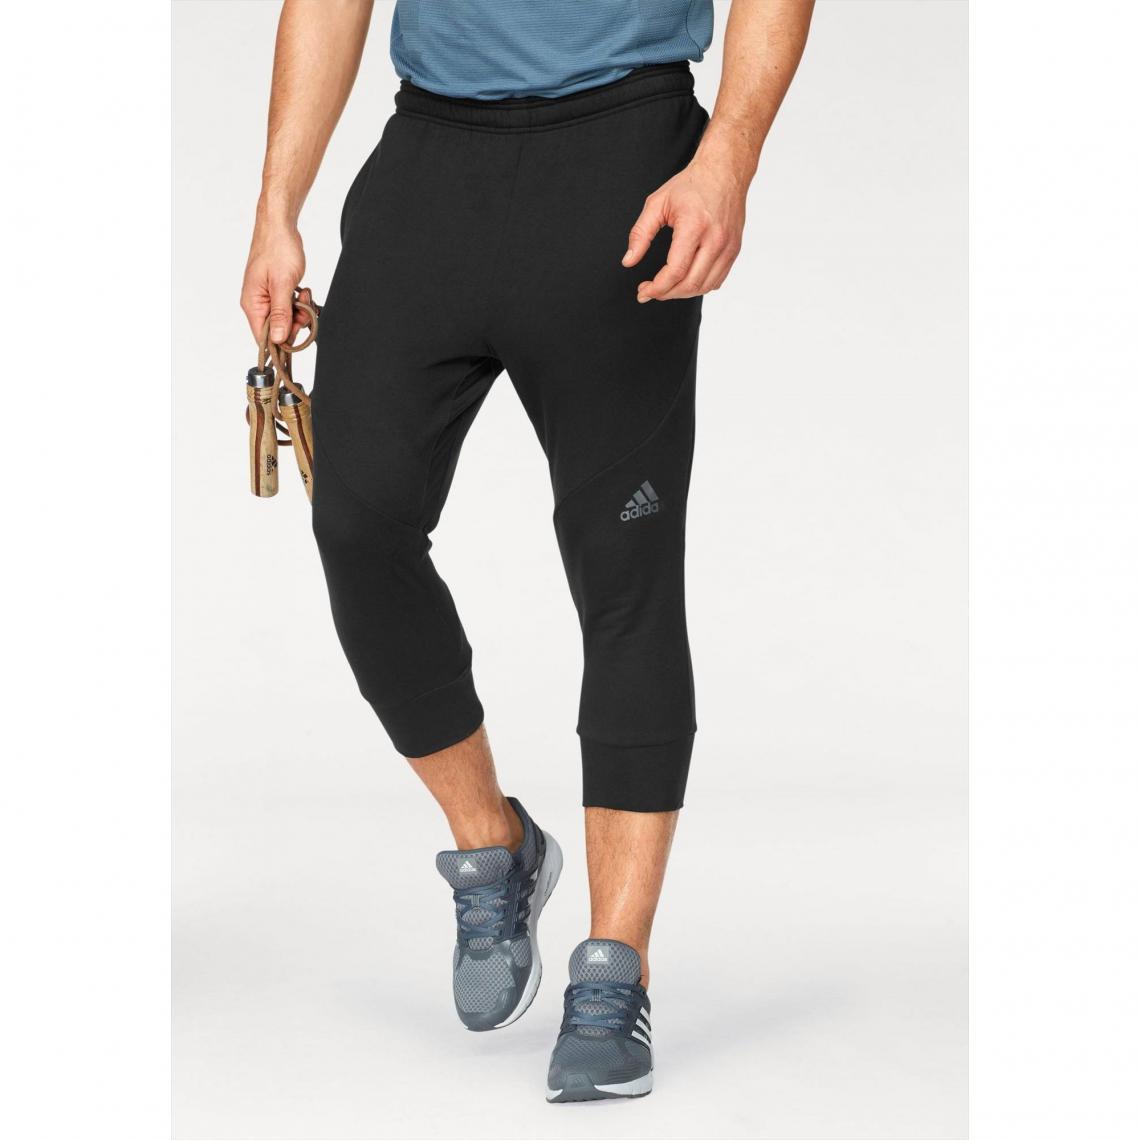 pantalon de sport 3 4 homme climacool adidas performance. Black Bedroom Furniture Sets. Home Design Ideas